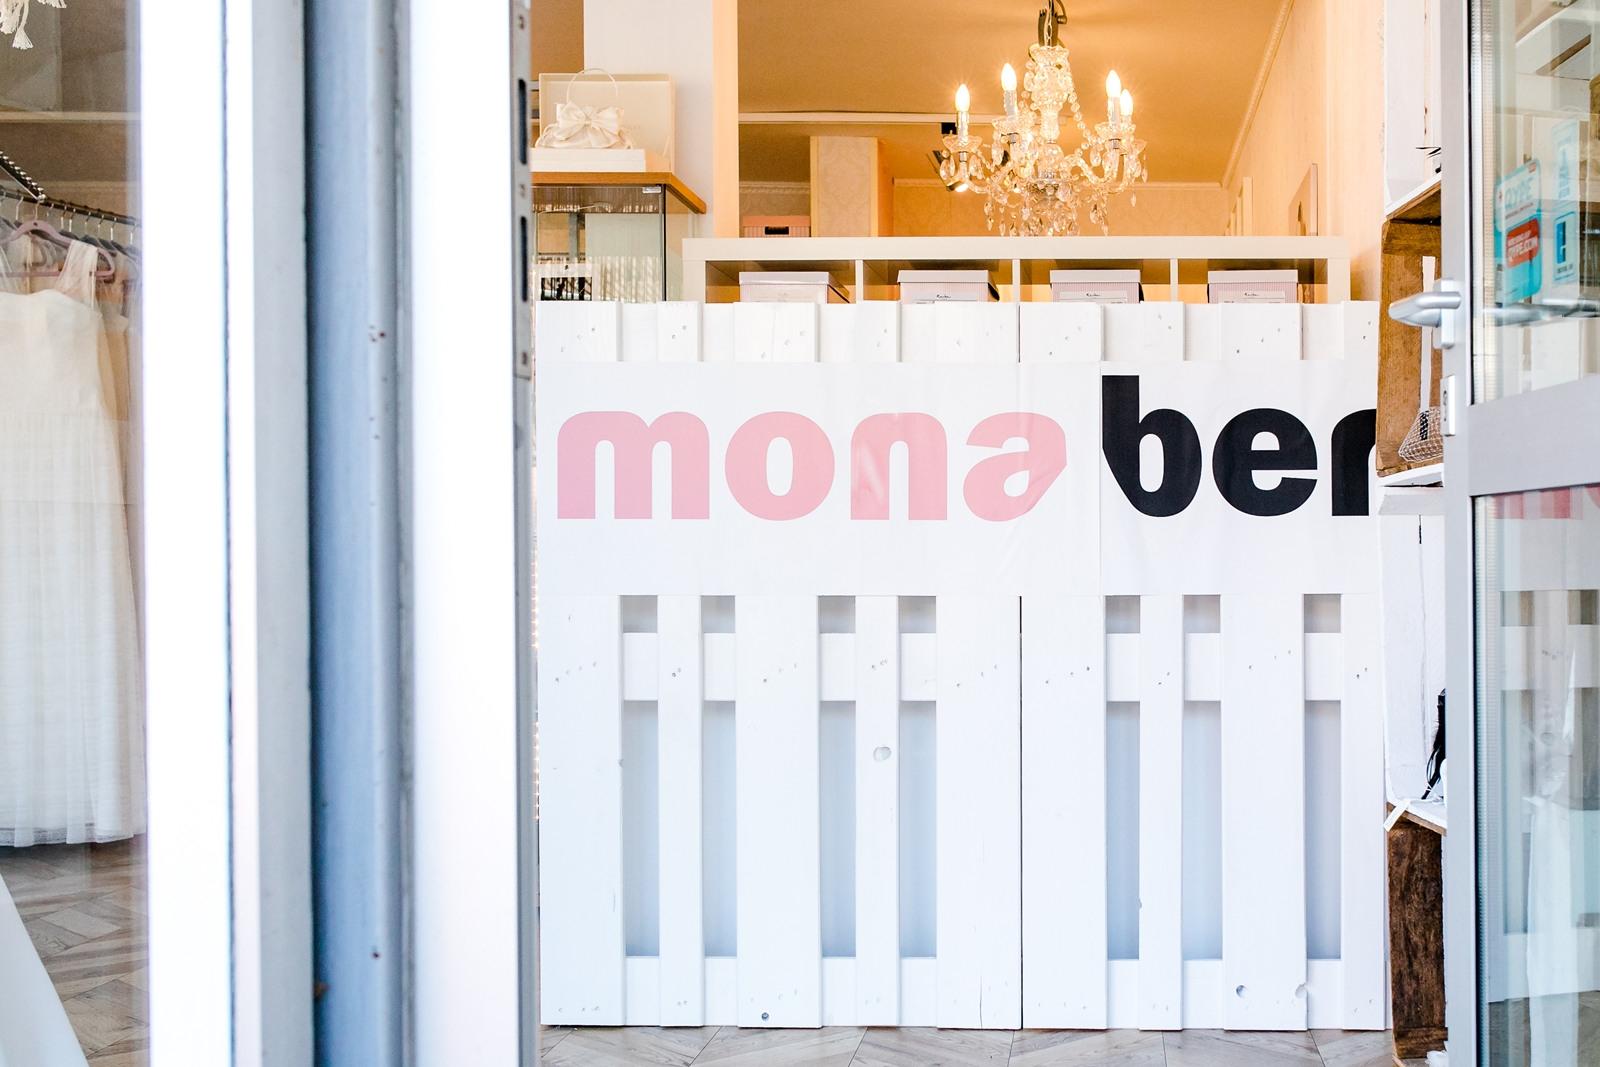 Cool Brautmode Shop Spezialgebiet17 Elegant Brautmode Shop Vertrieb